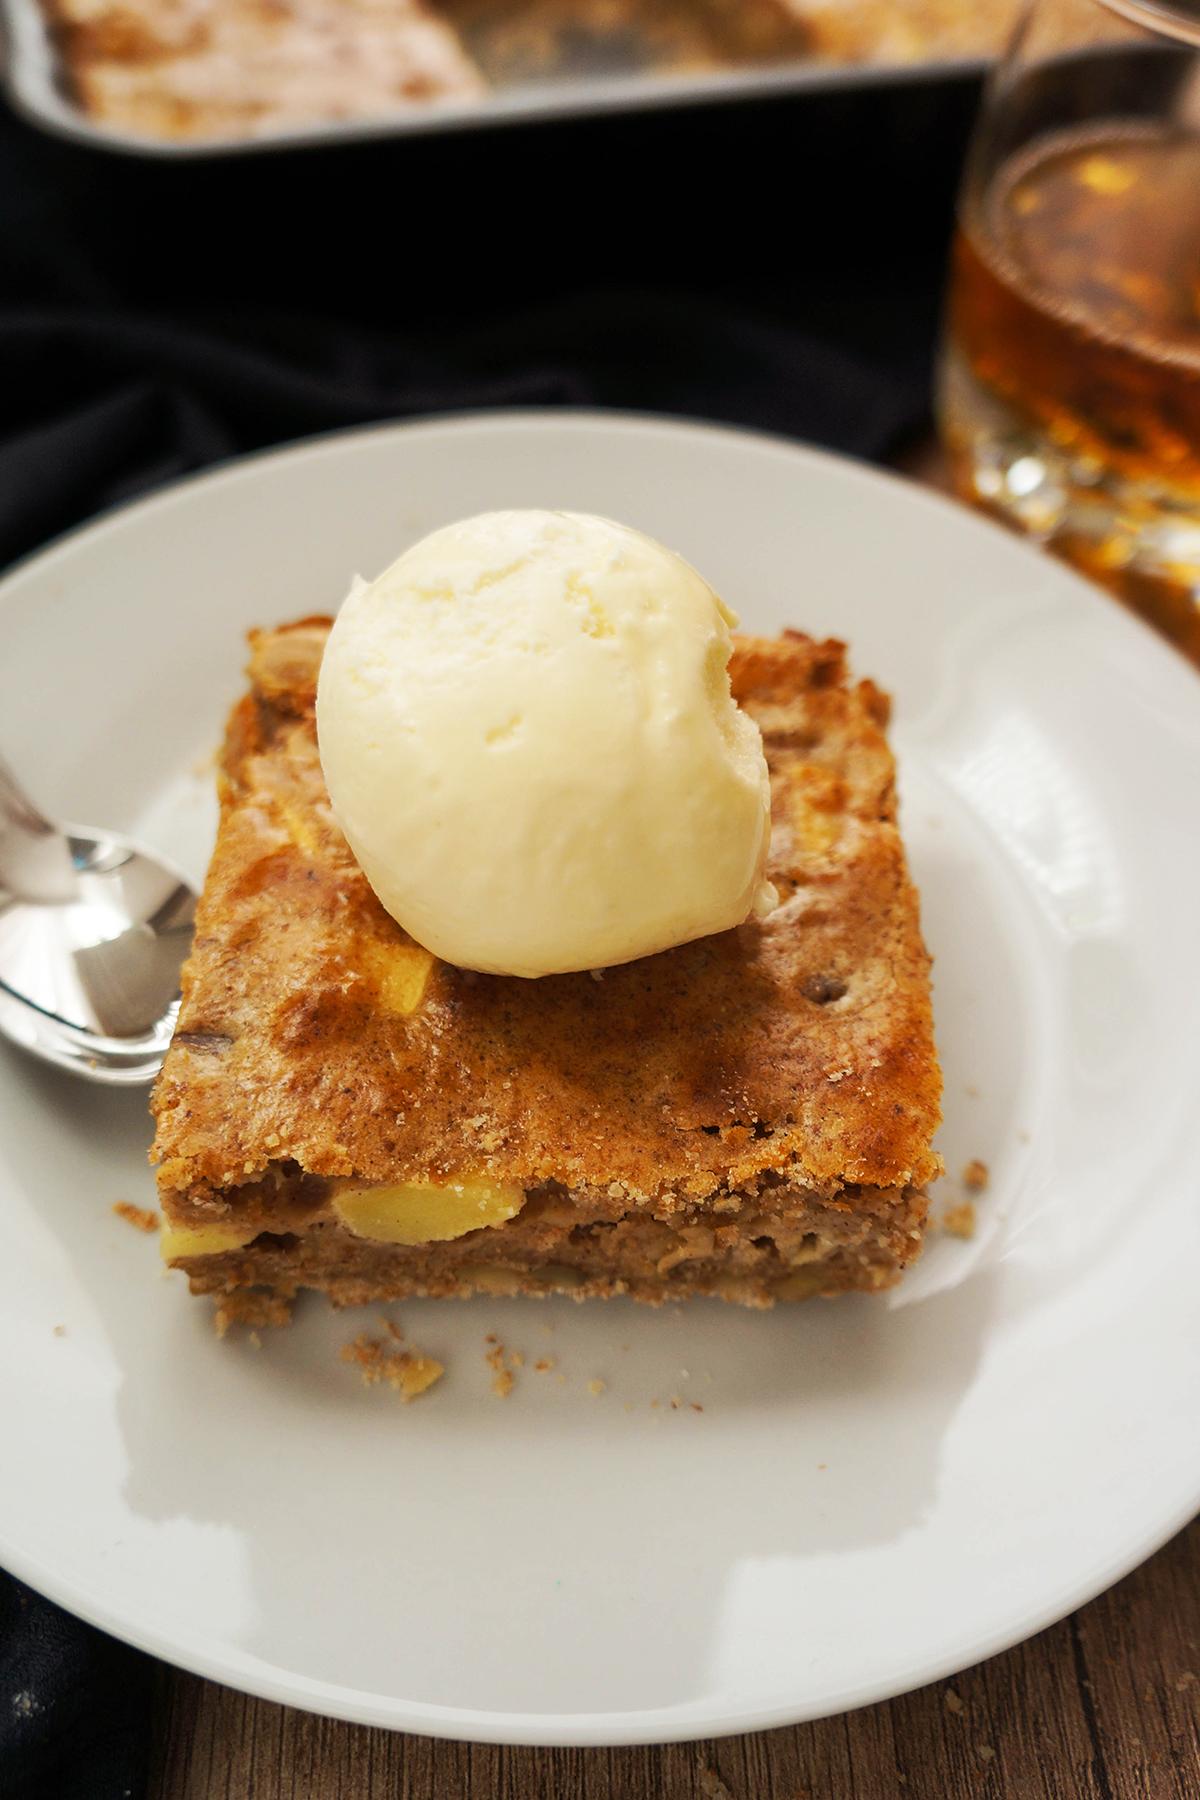 Jabolčno-orehovo pecivo